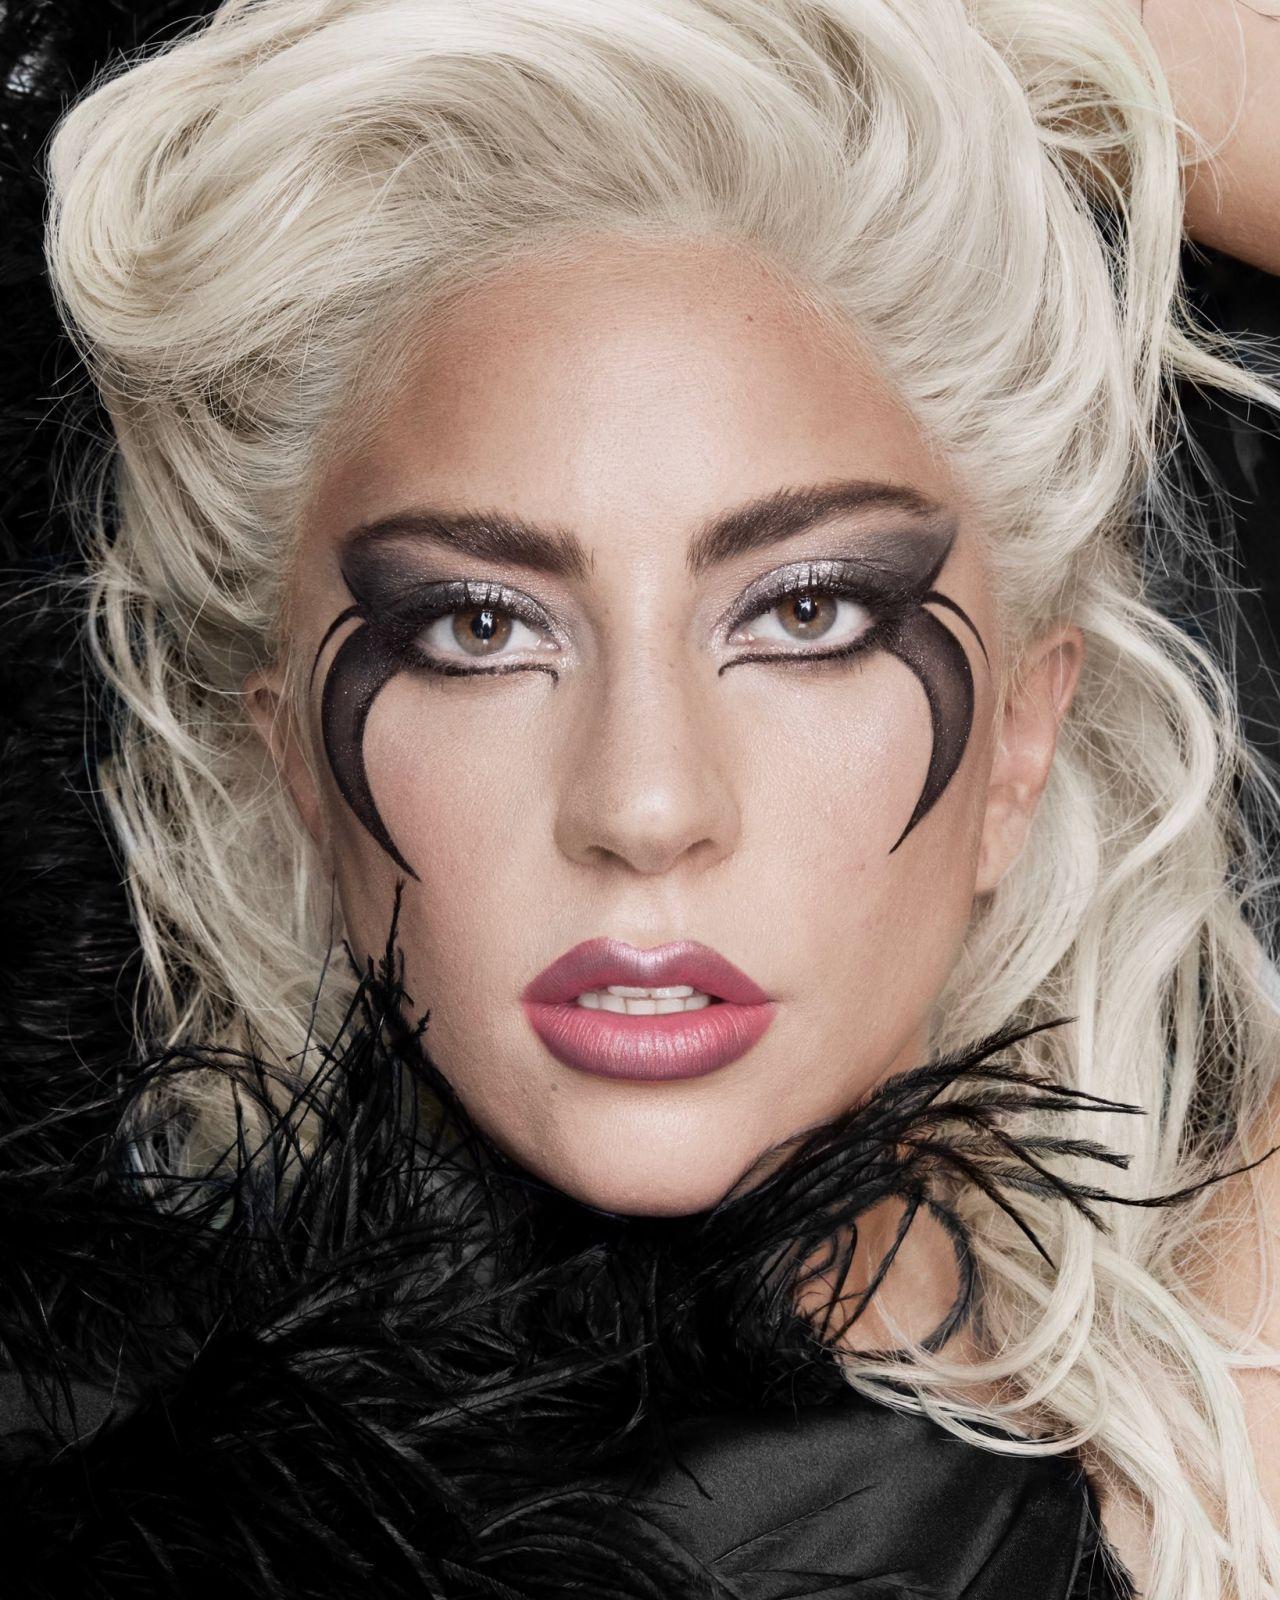 Lady Gaga Haus Beauty Promo Photoshoot July 2019